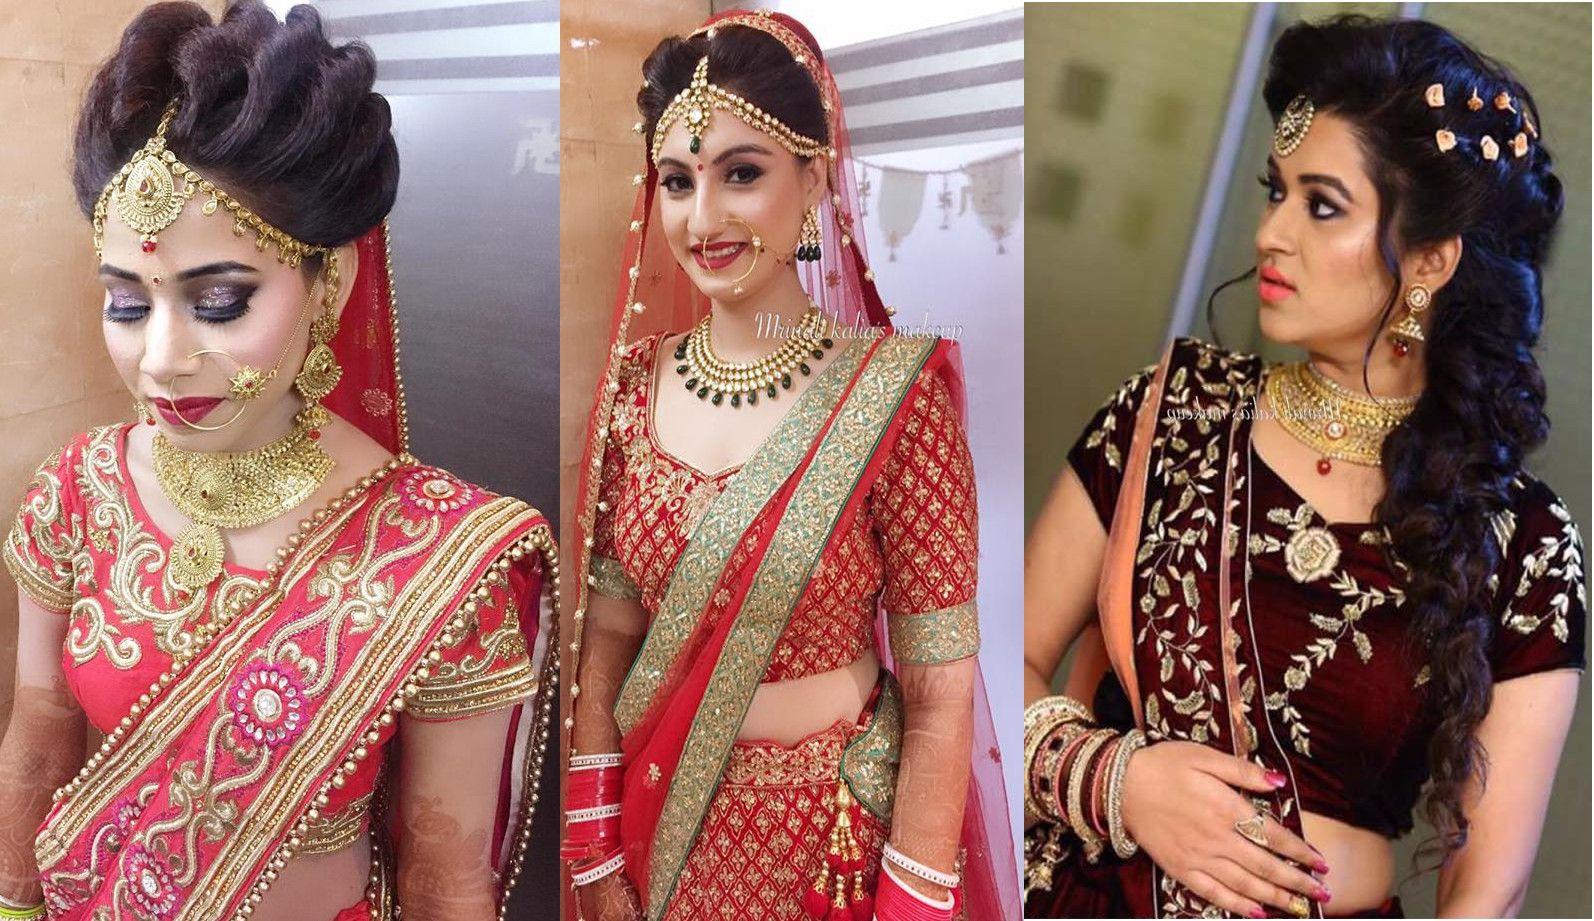 Get Airbrush Makeup Artist by kajal sharma. You can contact kajal sharma at +91-9810253024 for Best freelance makeup artist Delhi NCR.